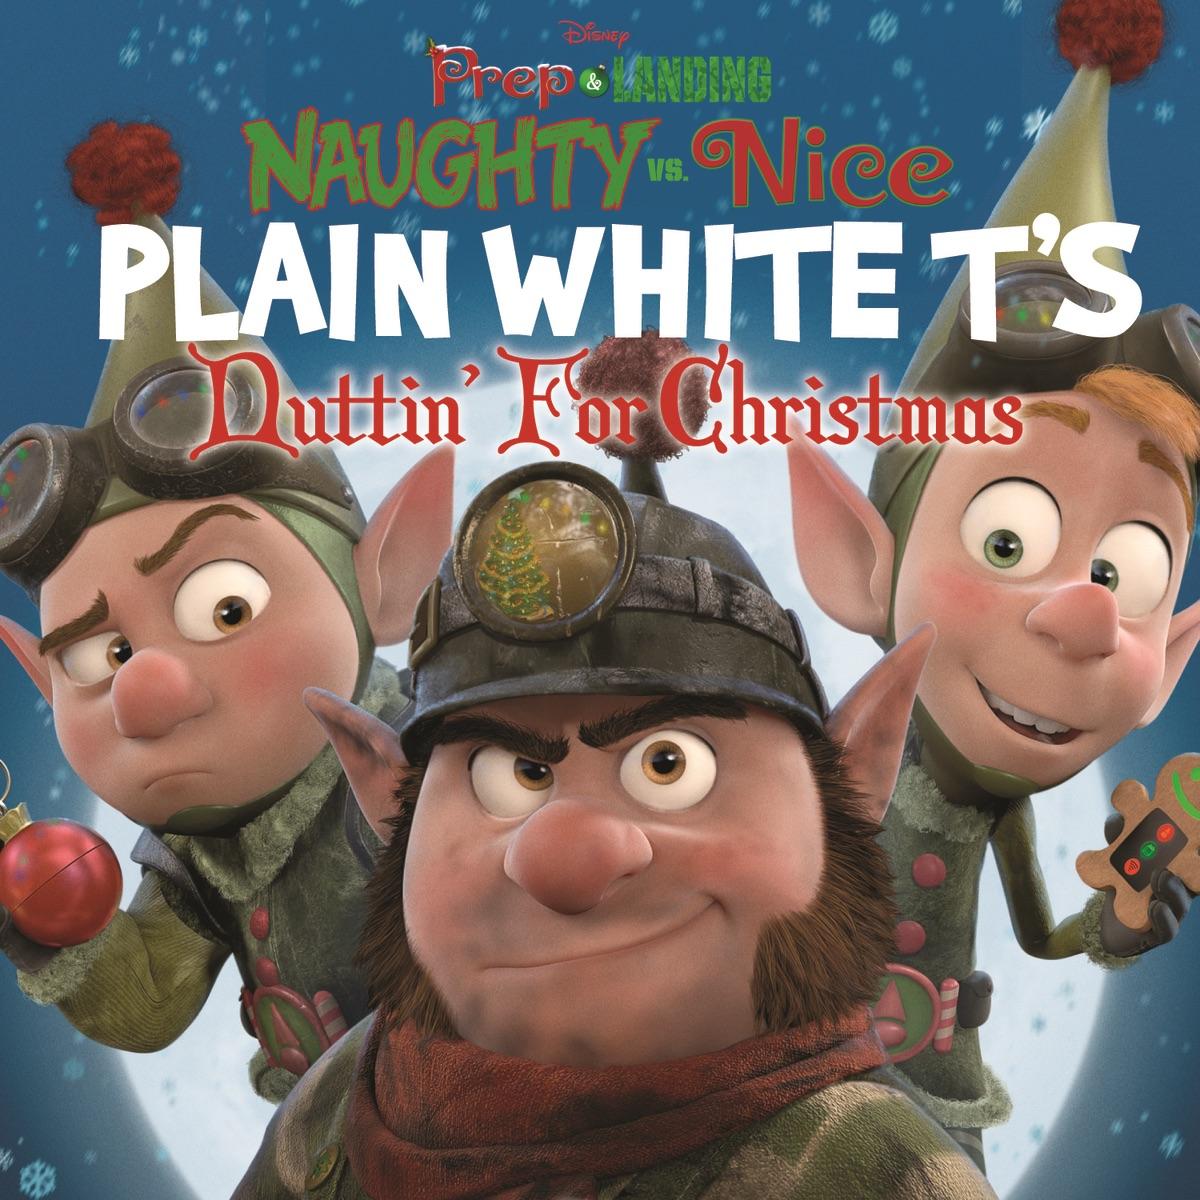 Nuttin\' for Christmas - Single Album Cover by Plain White T\'s